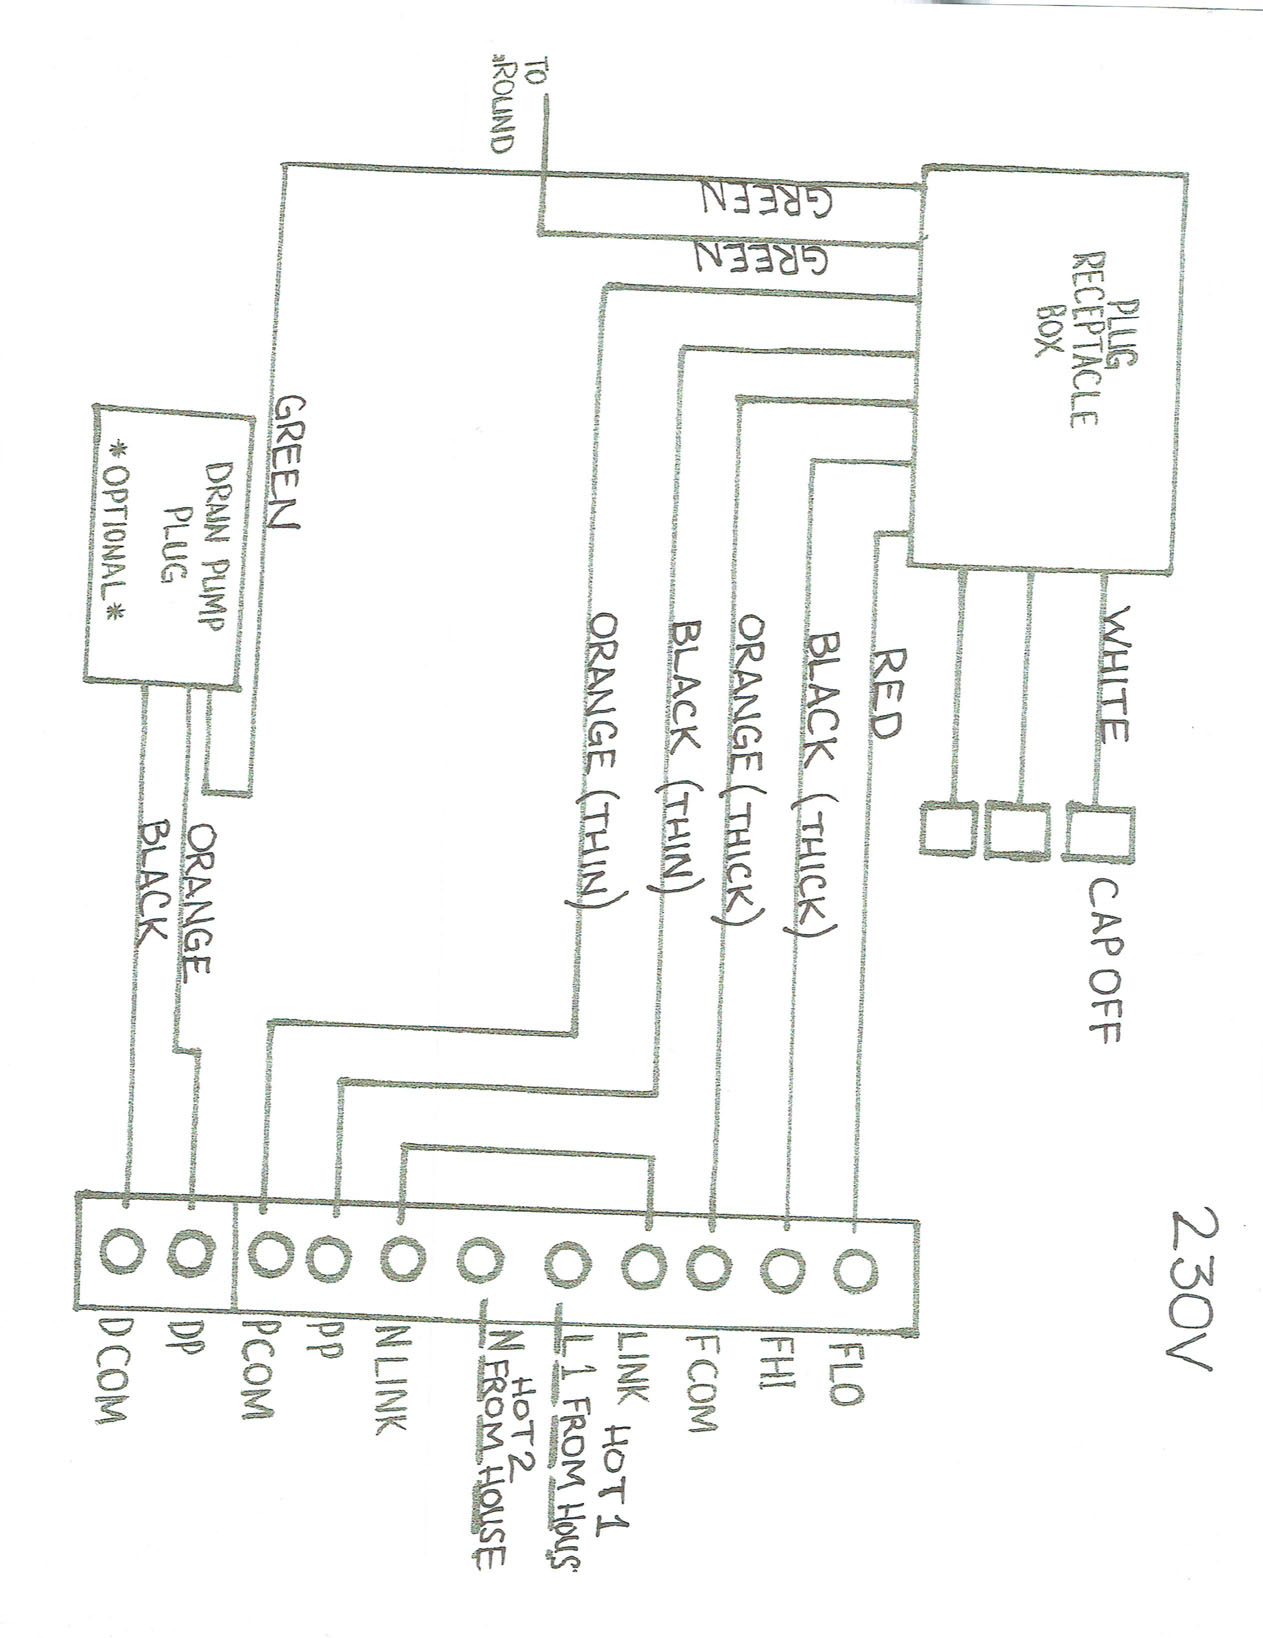 swamp cooler wiring diagram 95 mustang gt fuel pump mastercool evaporative evap